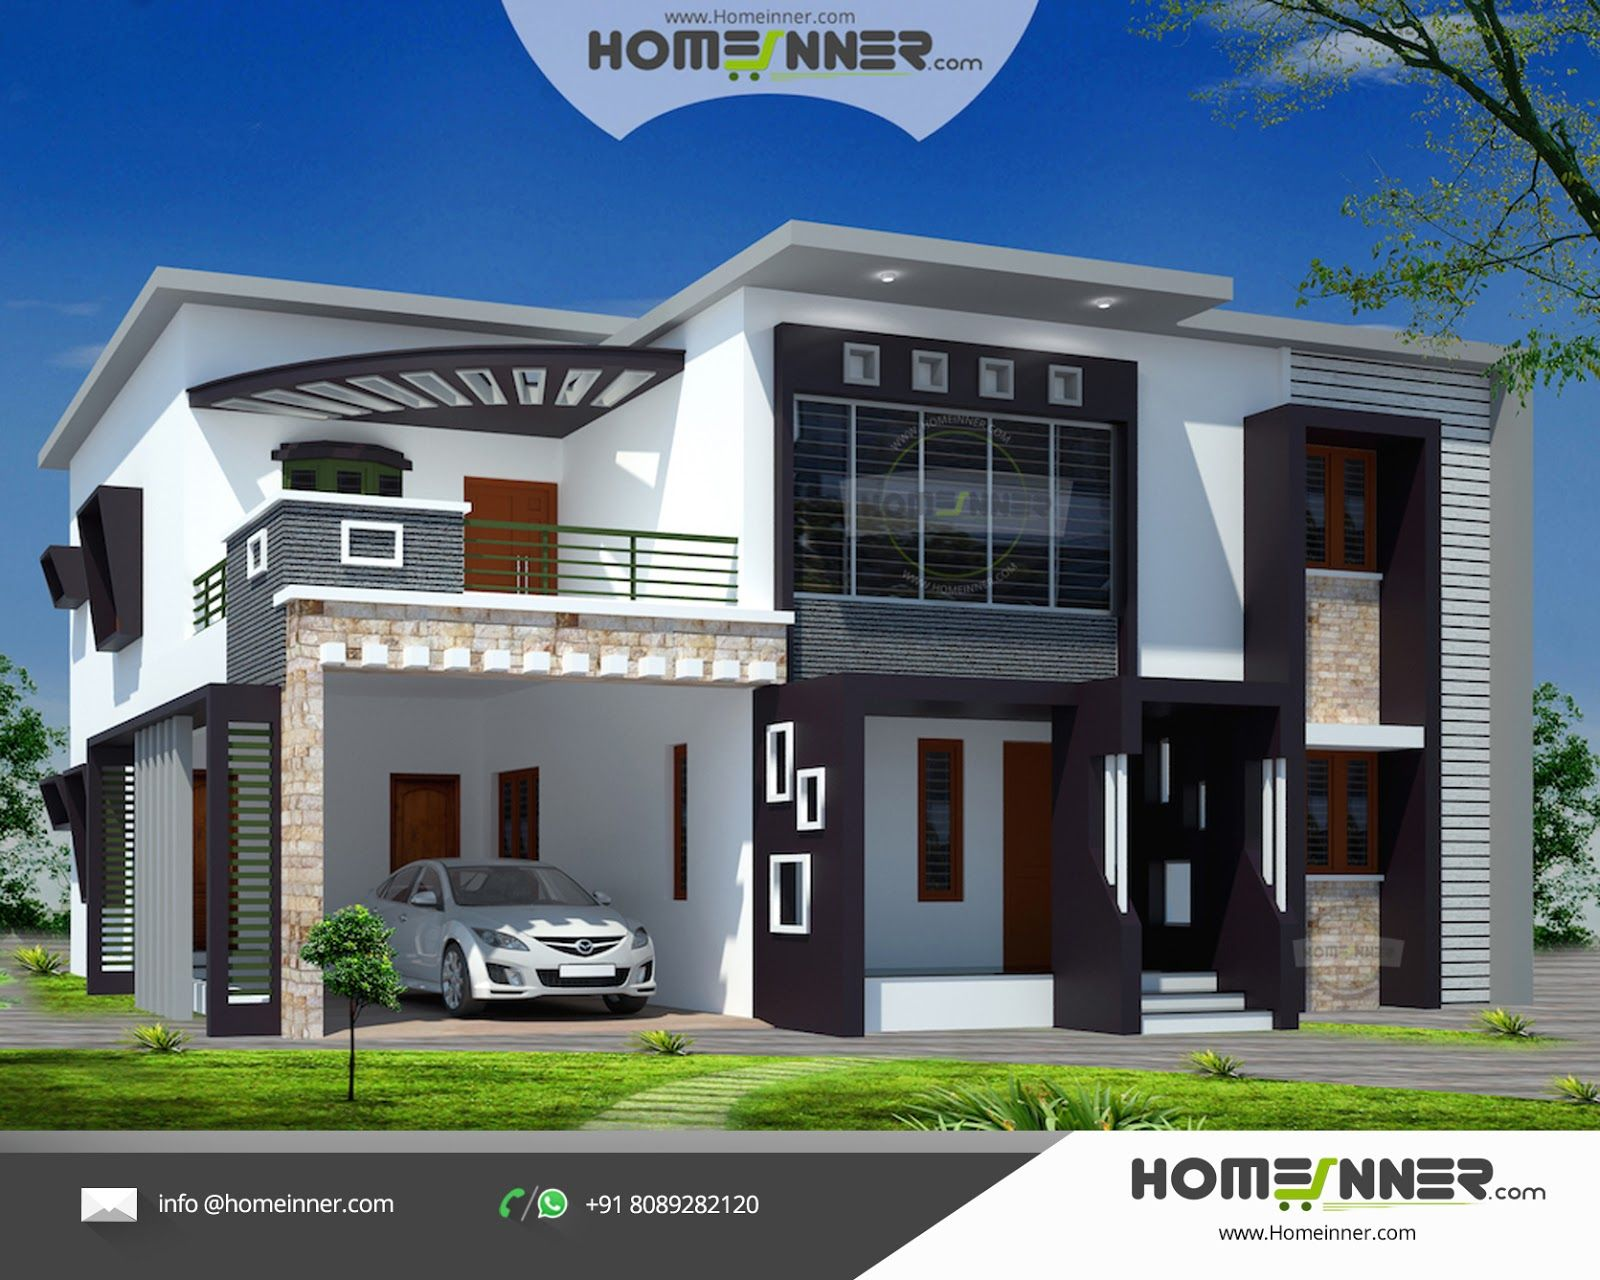 Top modern house designs ever built also drawing design rh pinterest